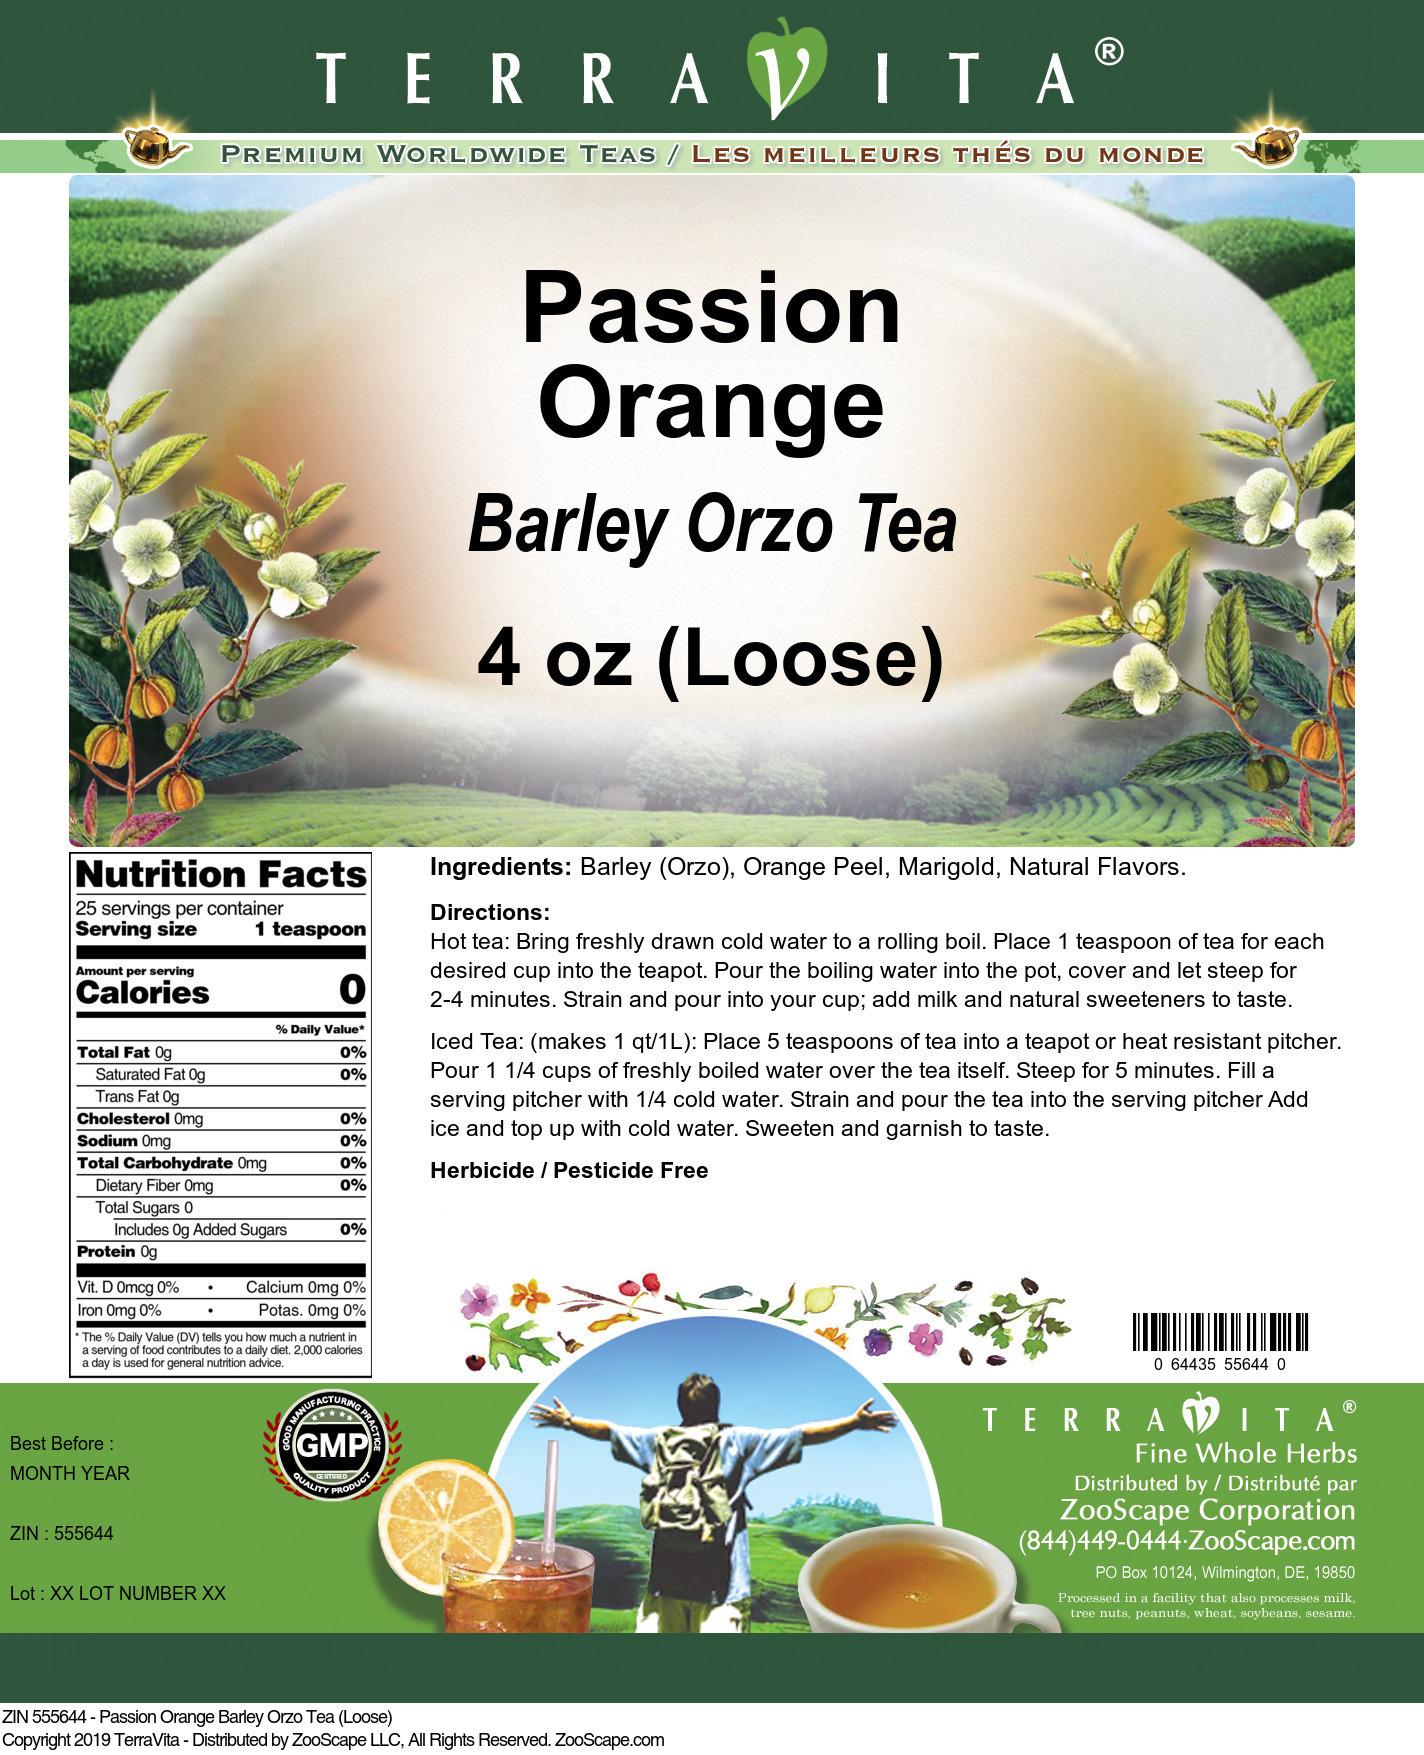 Passion Orange Barley Orzo Tea (Loose)